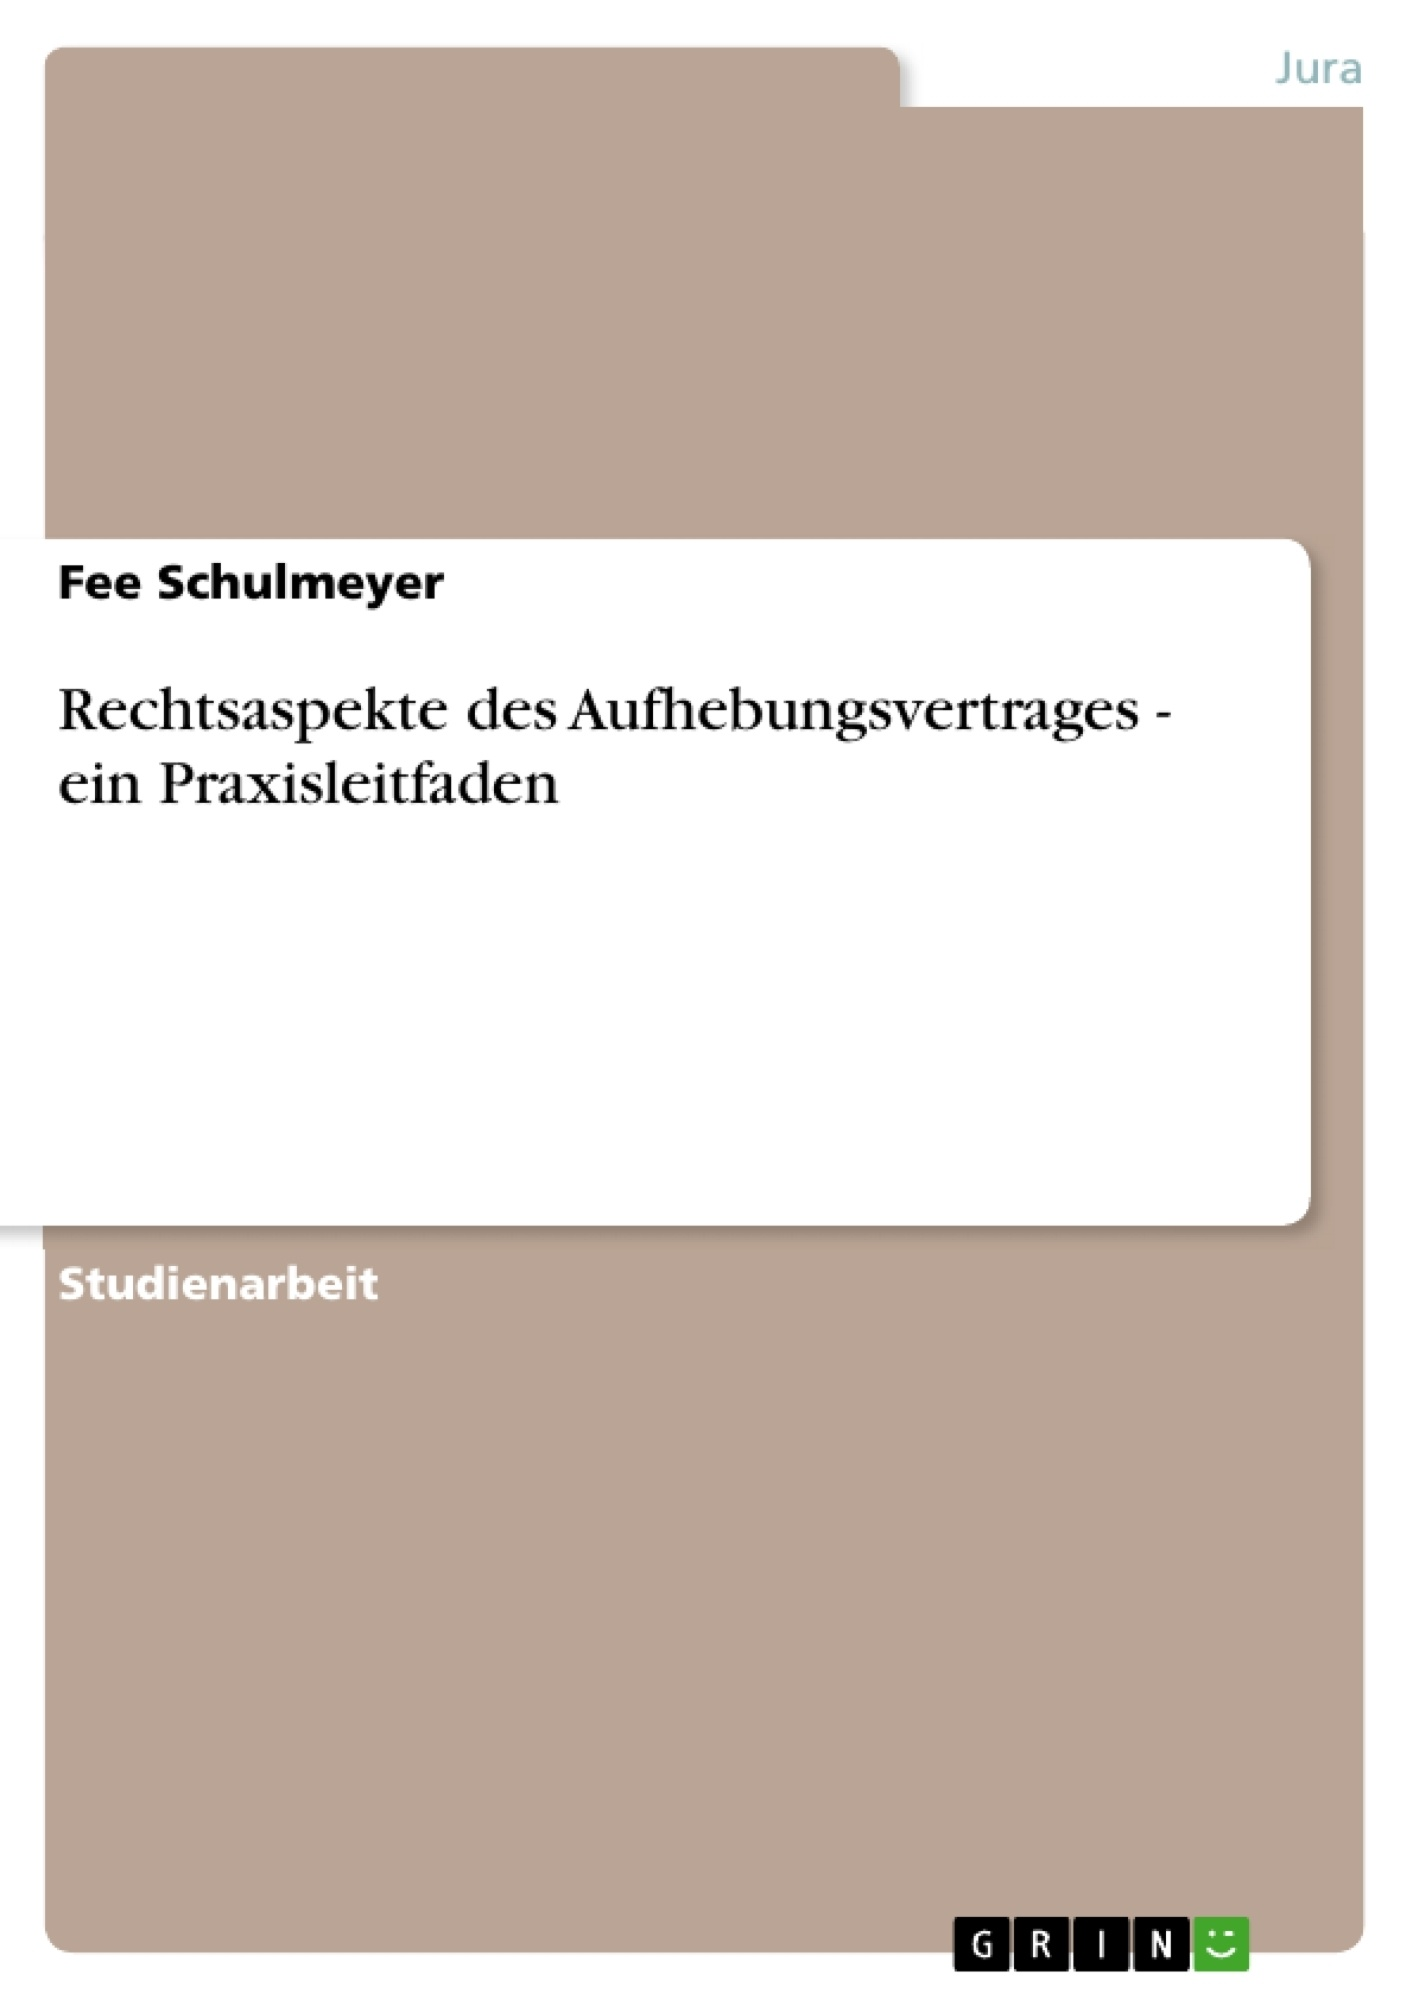 Titel: Rechtsaspekte des Aufhebungsvertrages - ein Praxisleitfaden